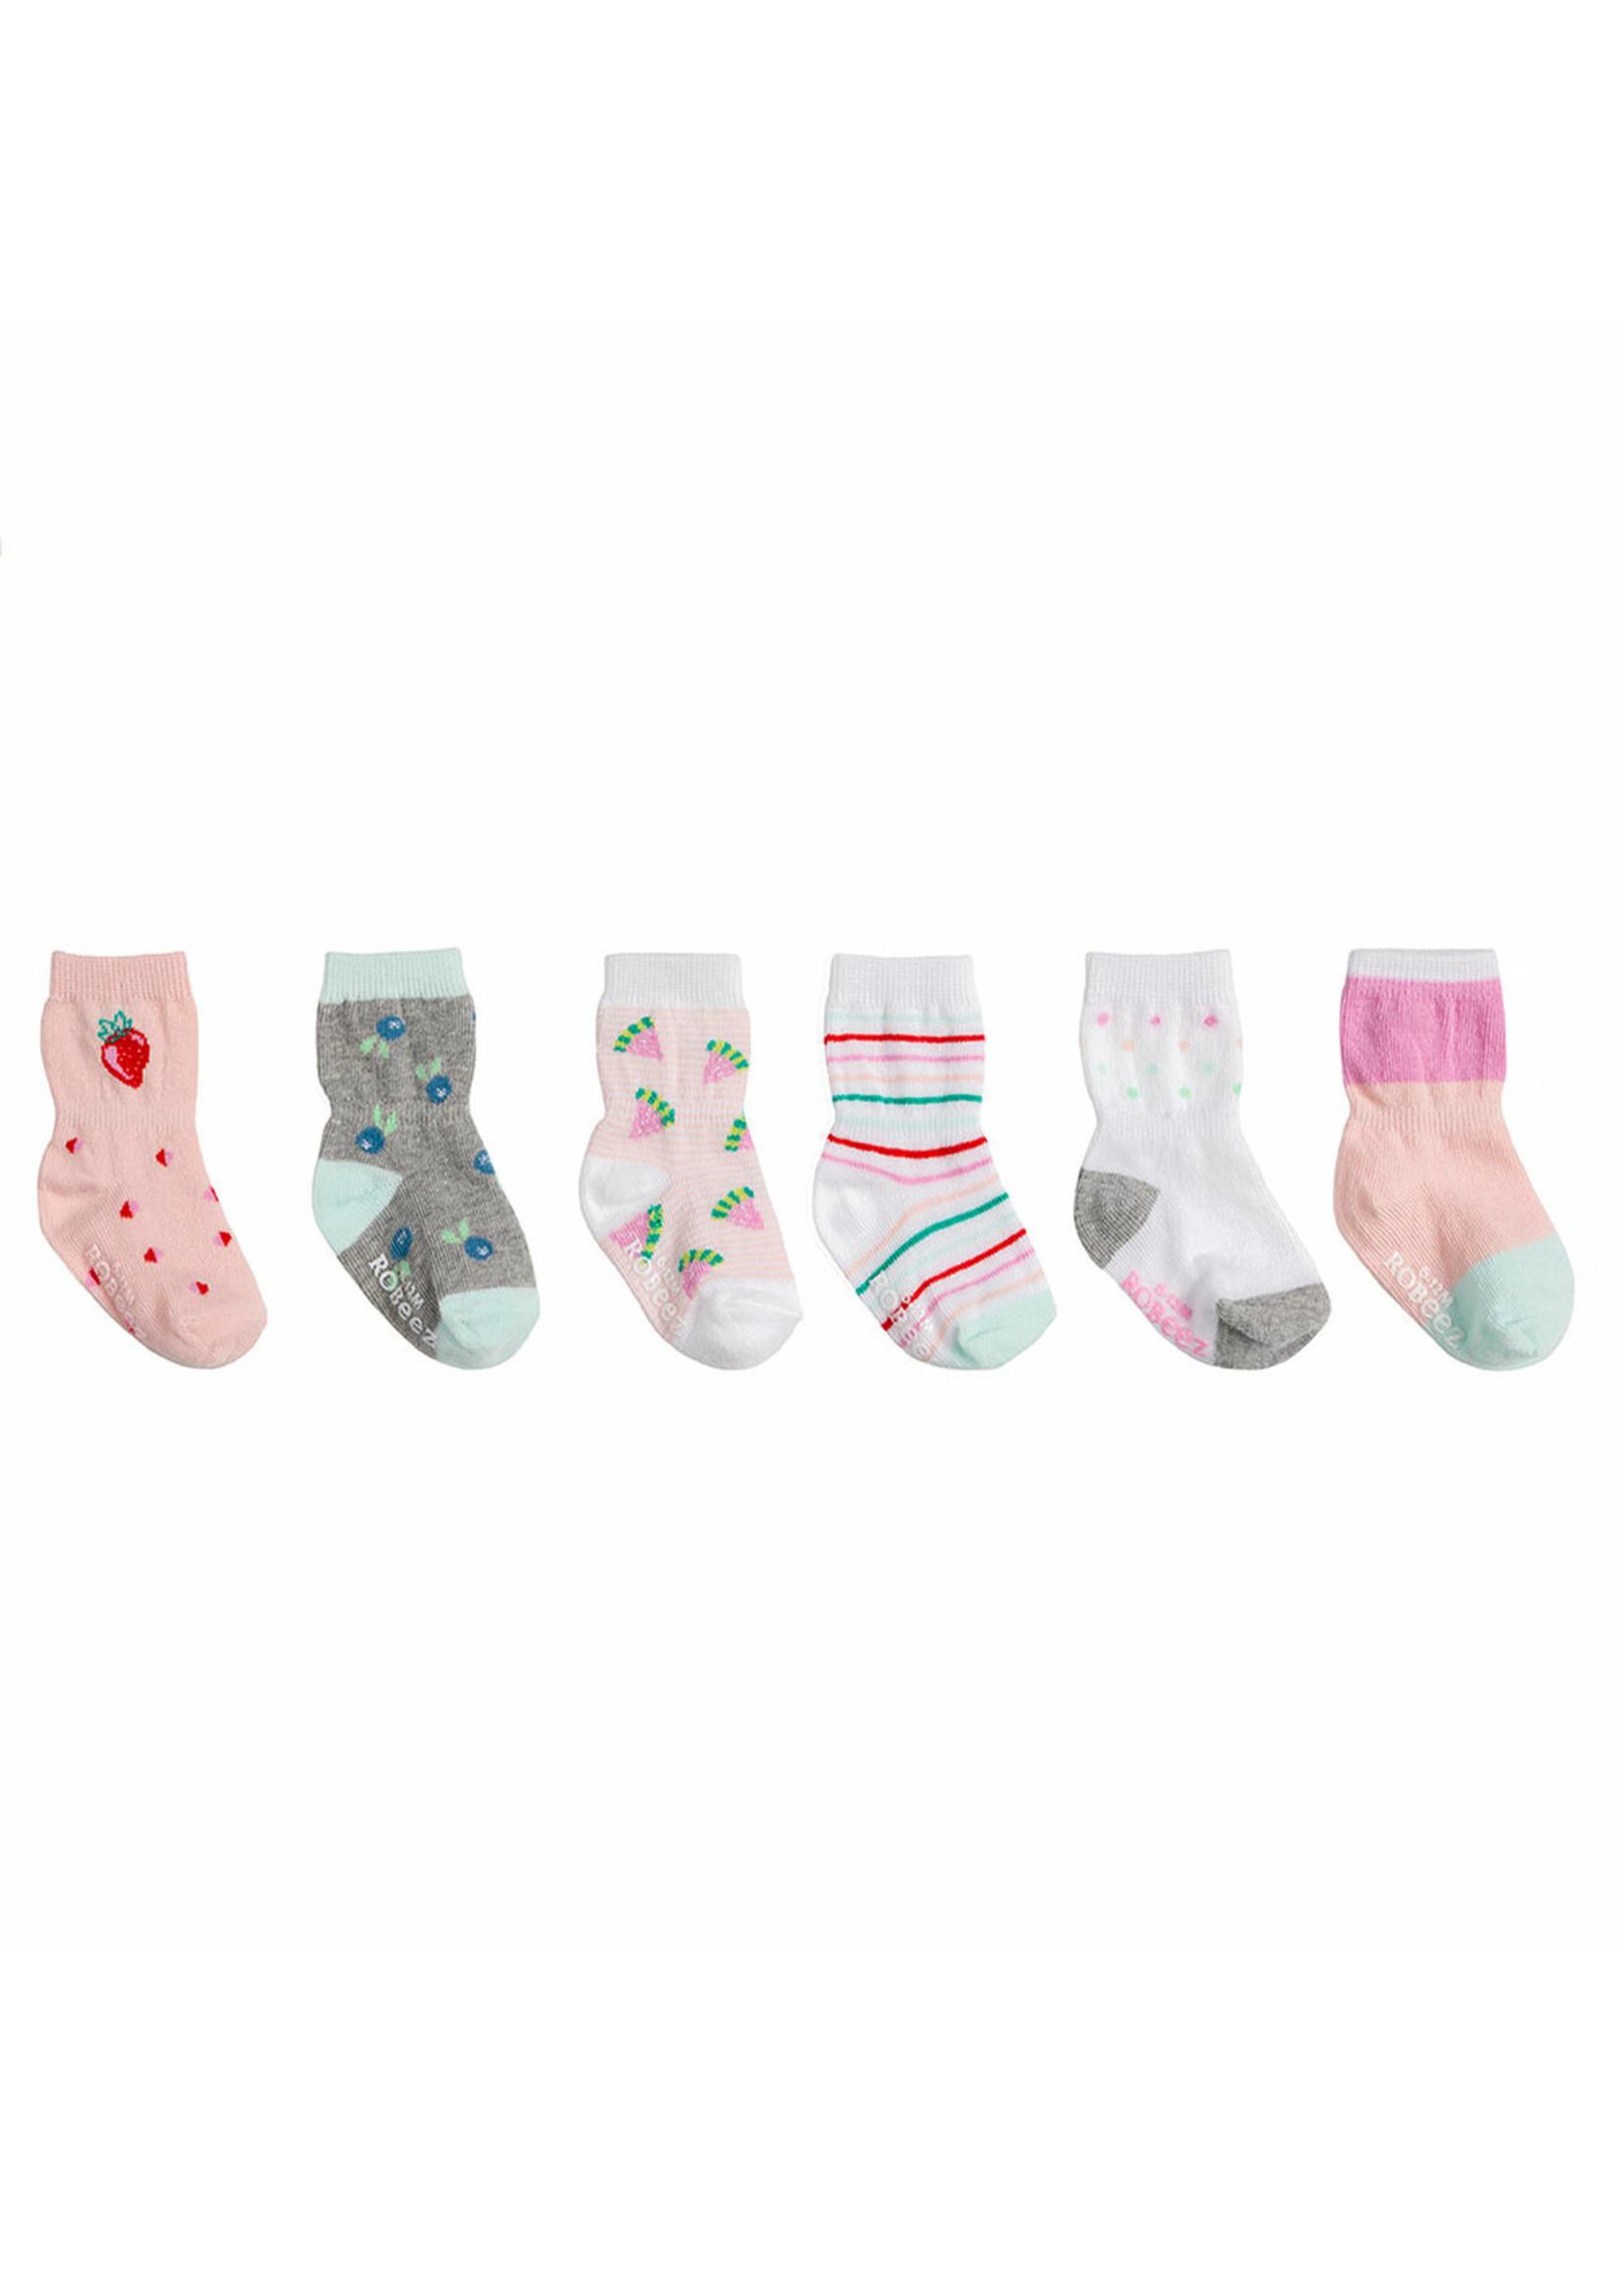 Robeez 6-Pair Fruit Prints Baby Socks